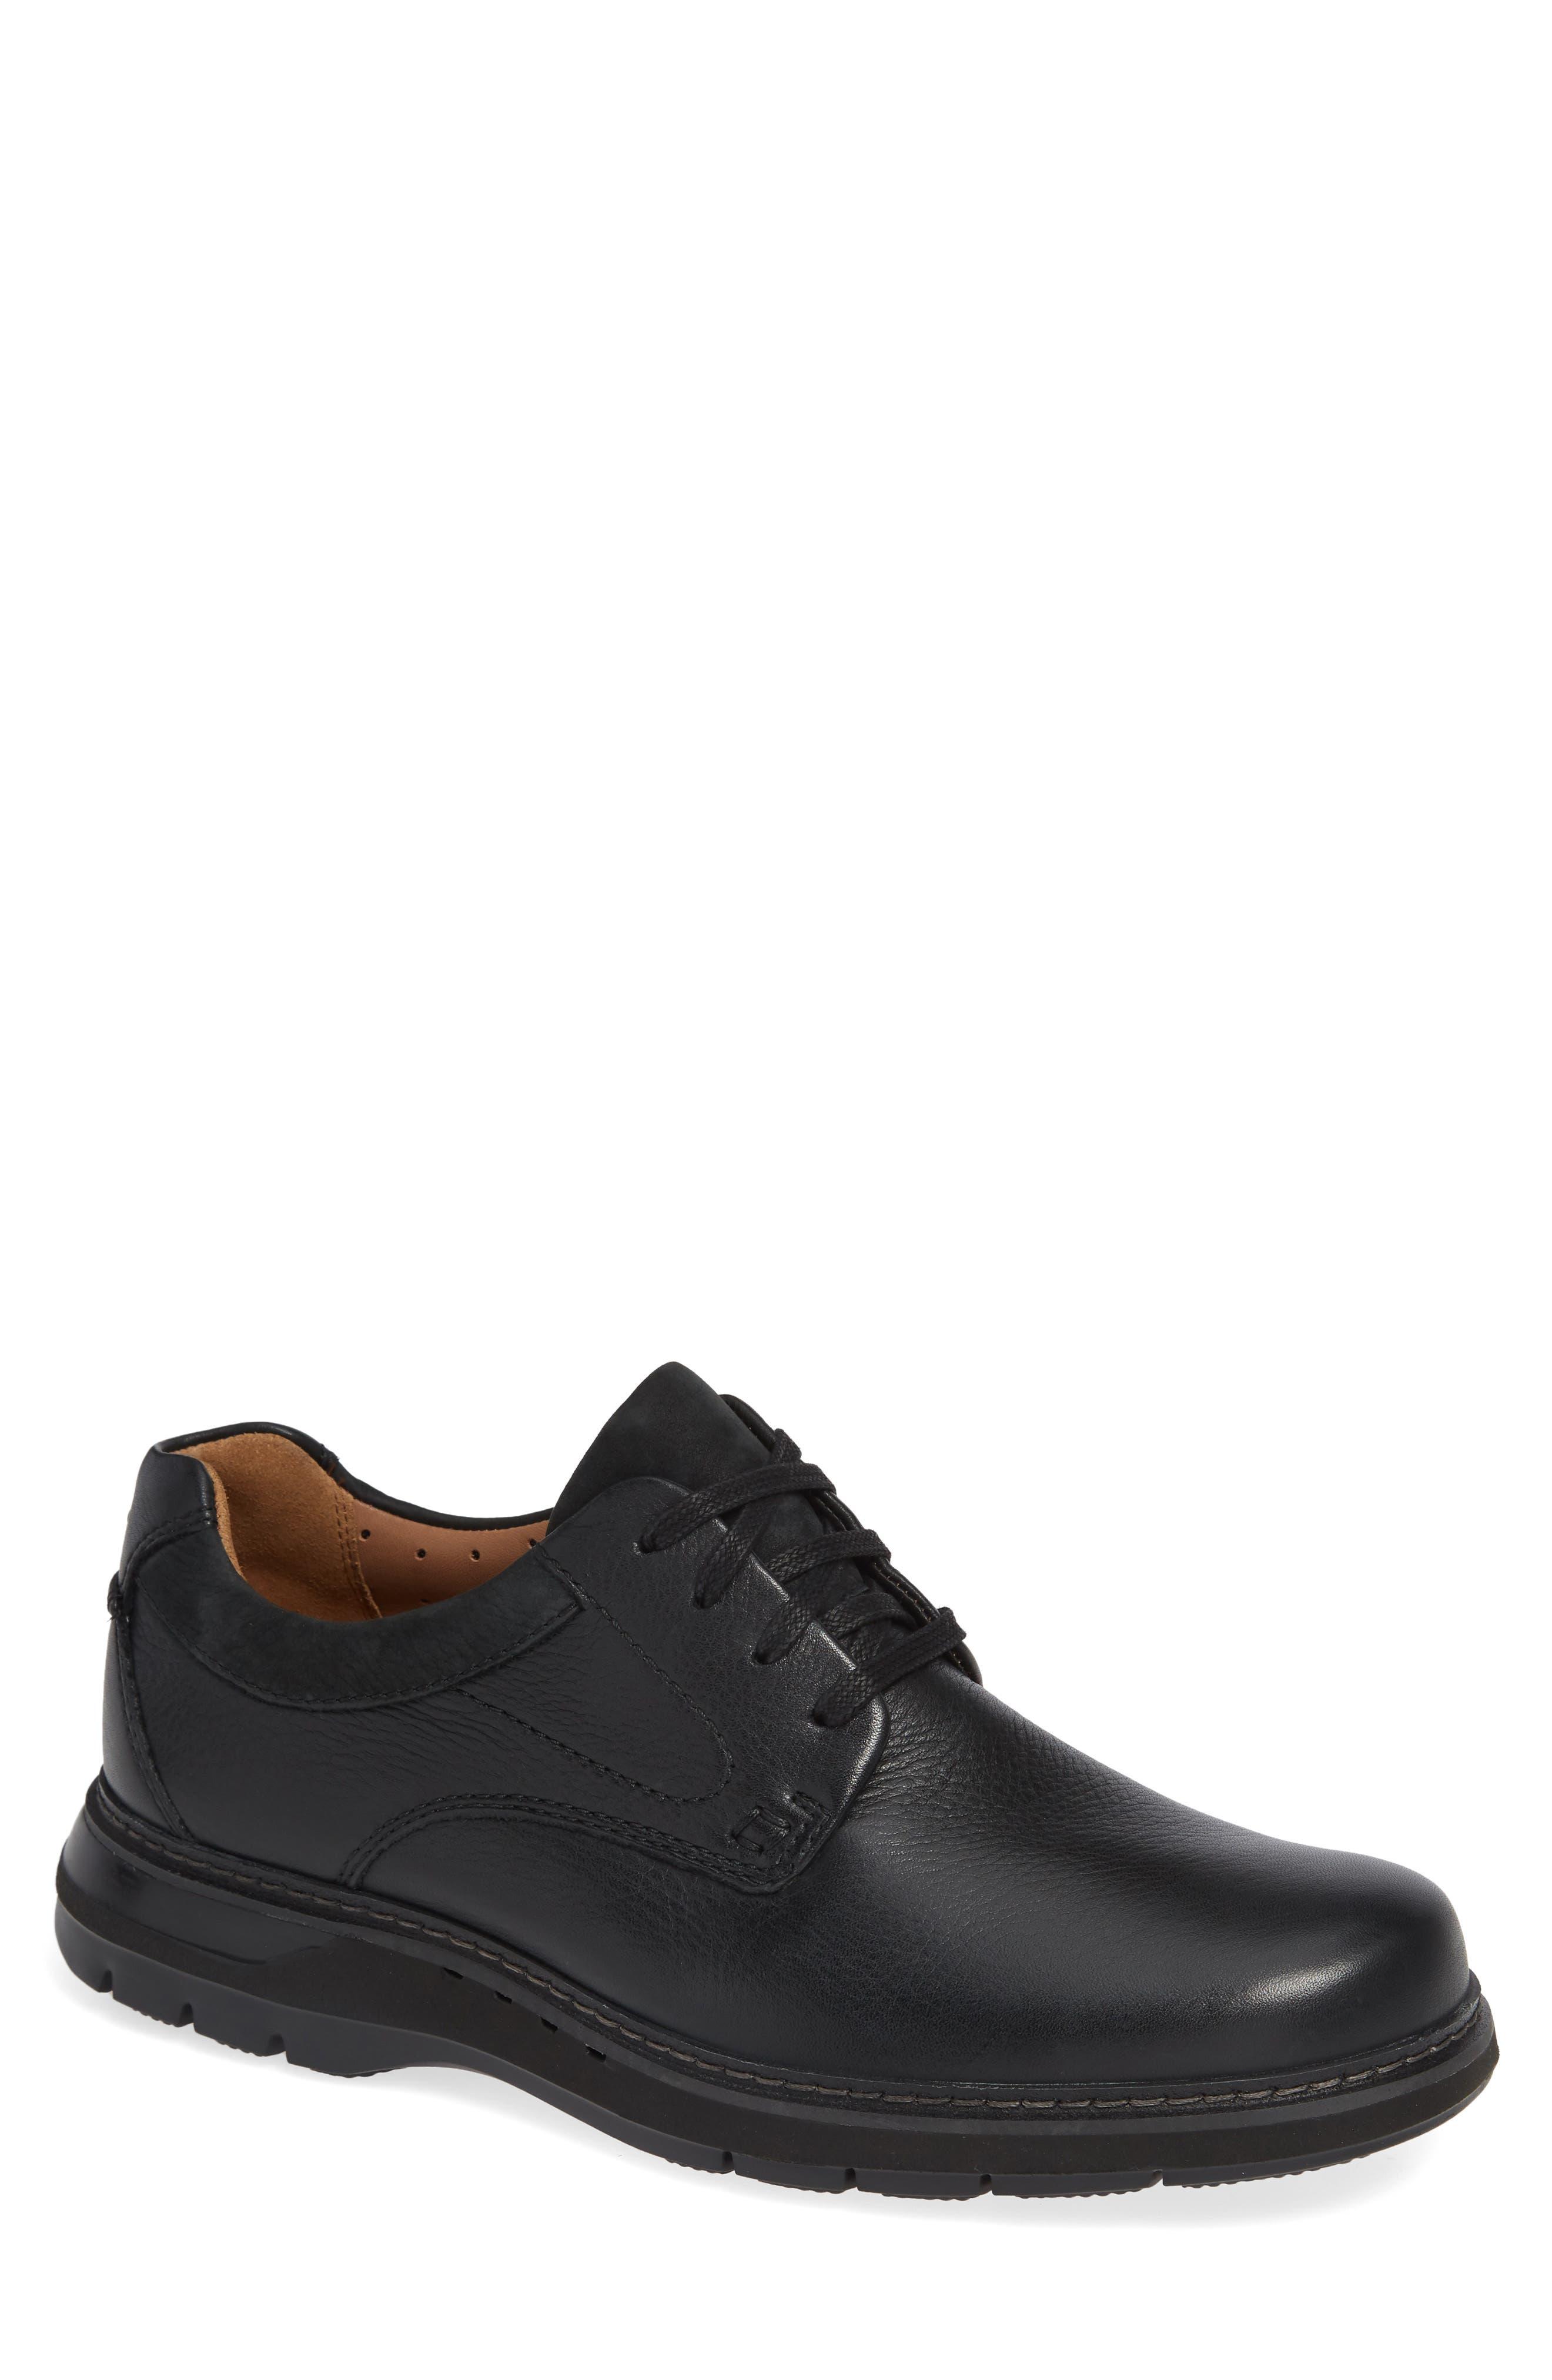 Un Ramble Lo Plain Toe Derby,                         Main,                         color, BLACK LEATHER